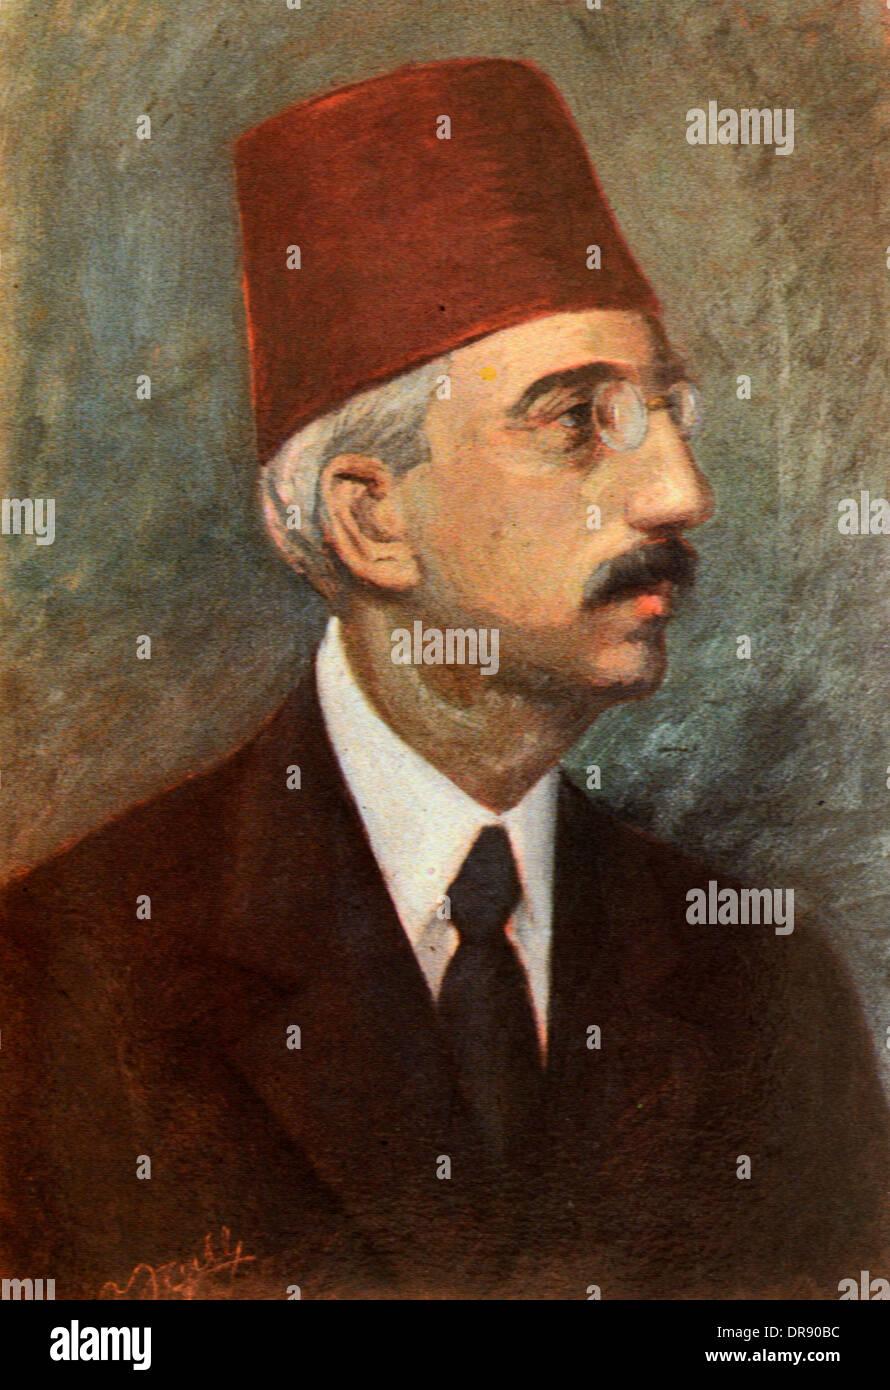 Ottoman Turkish Sultan Mehmet VI (1861-1926) Portrait ...